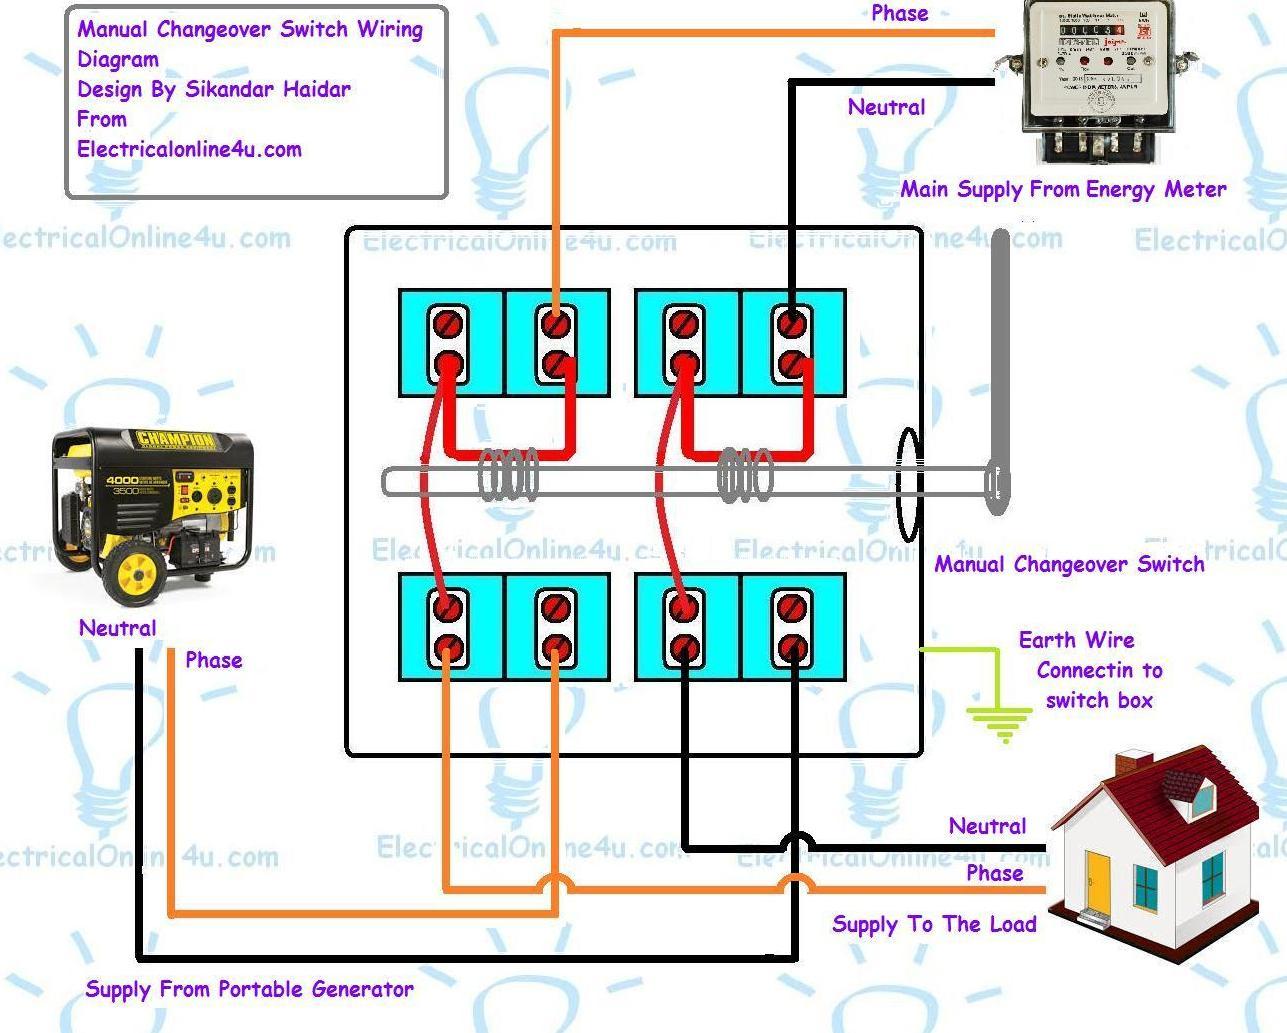 [DIAGRAM_5UK]  SS_9397] Champion 4000 Watt Wiring Diagram Get Free Image About Wiring  Wiring Diagram | Champion Generator Wiring Diagram |  | Gue45 Inkl Grebs Gue45 Weasi Semec Hete Reda Inrebe Trons Mohammedshrine  Librar Wiring 101